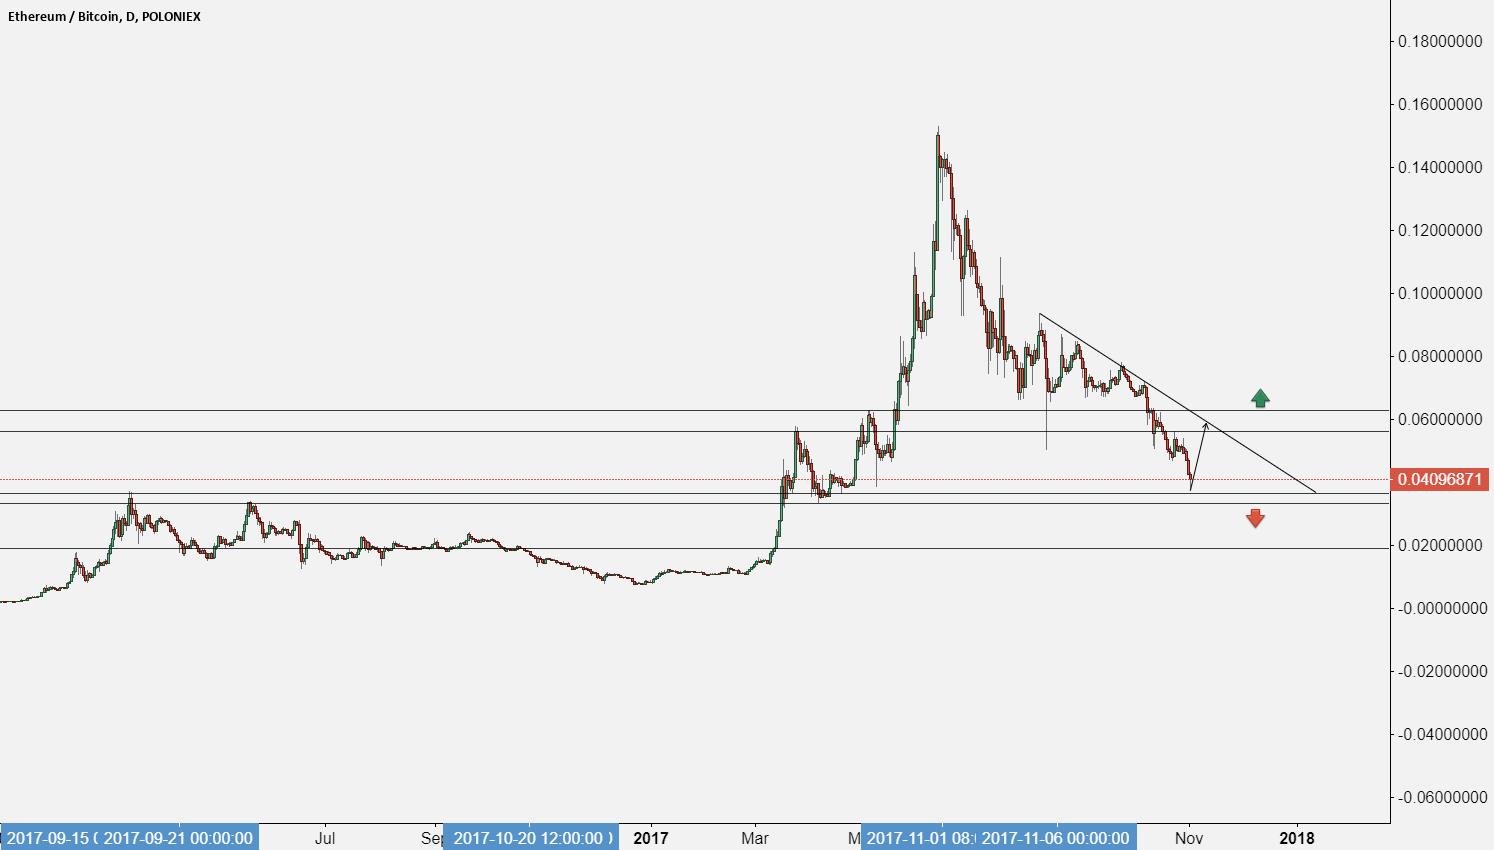 ETH/BTC last bottom